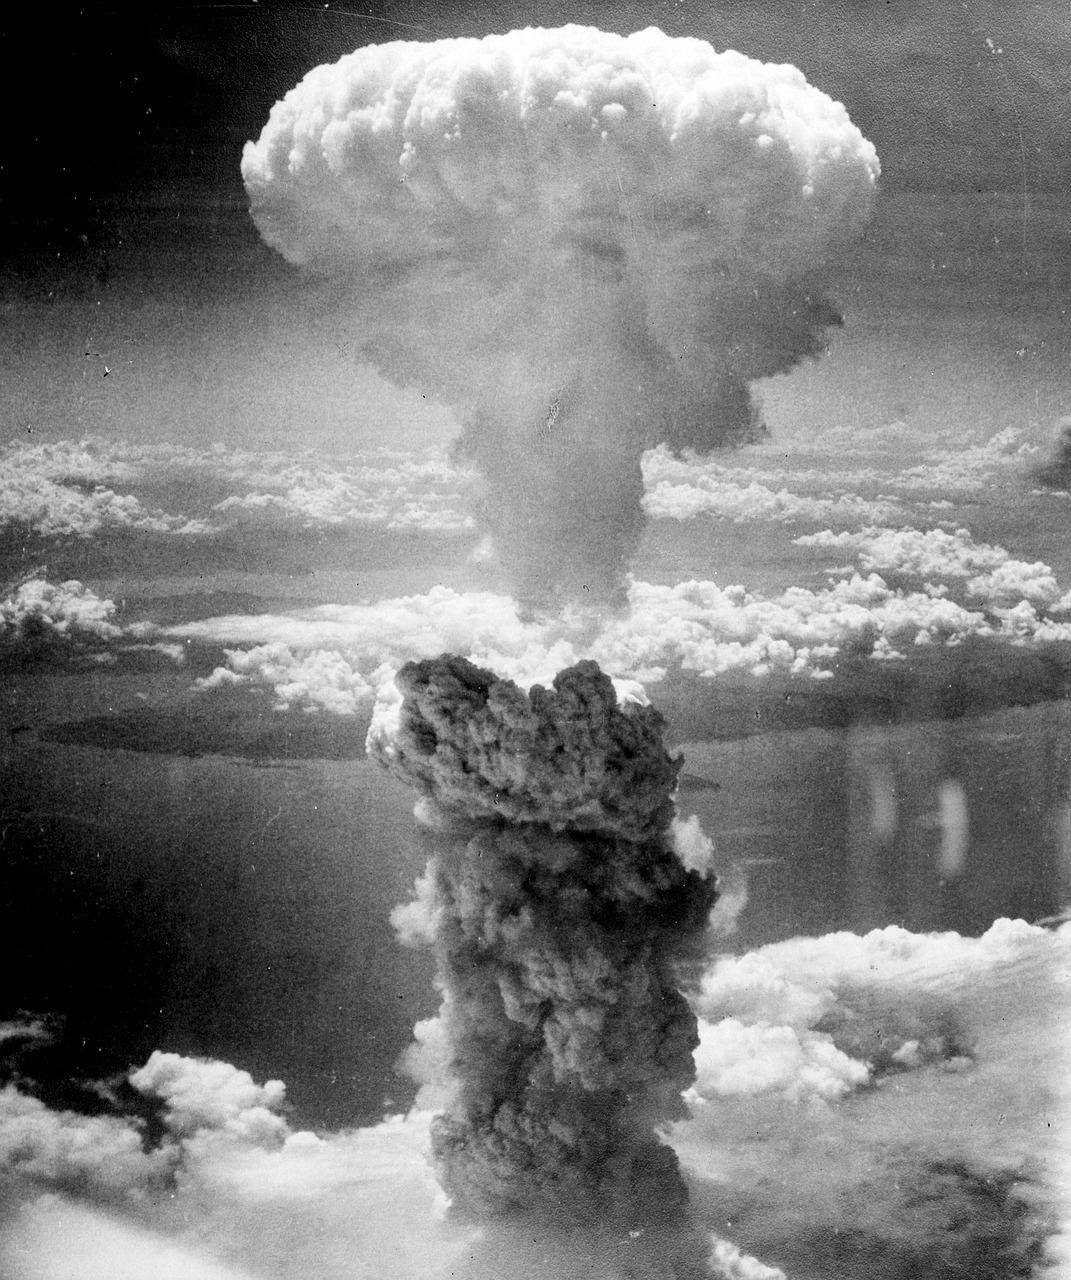 Nagasaki Nuclear Bomb (1945)